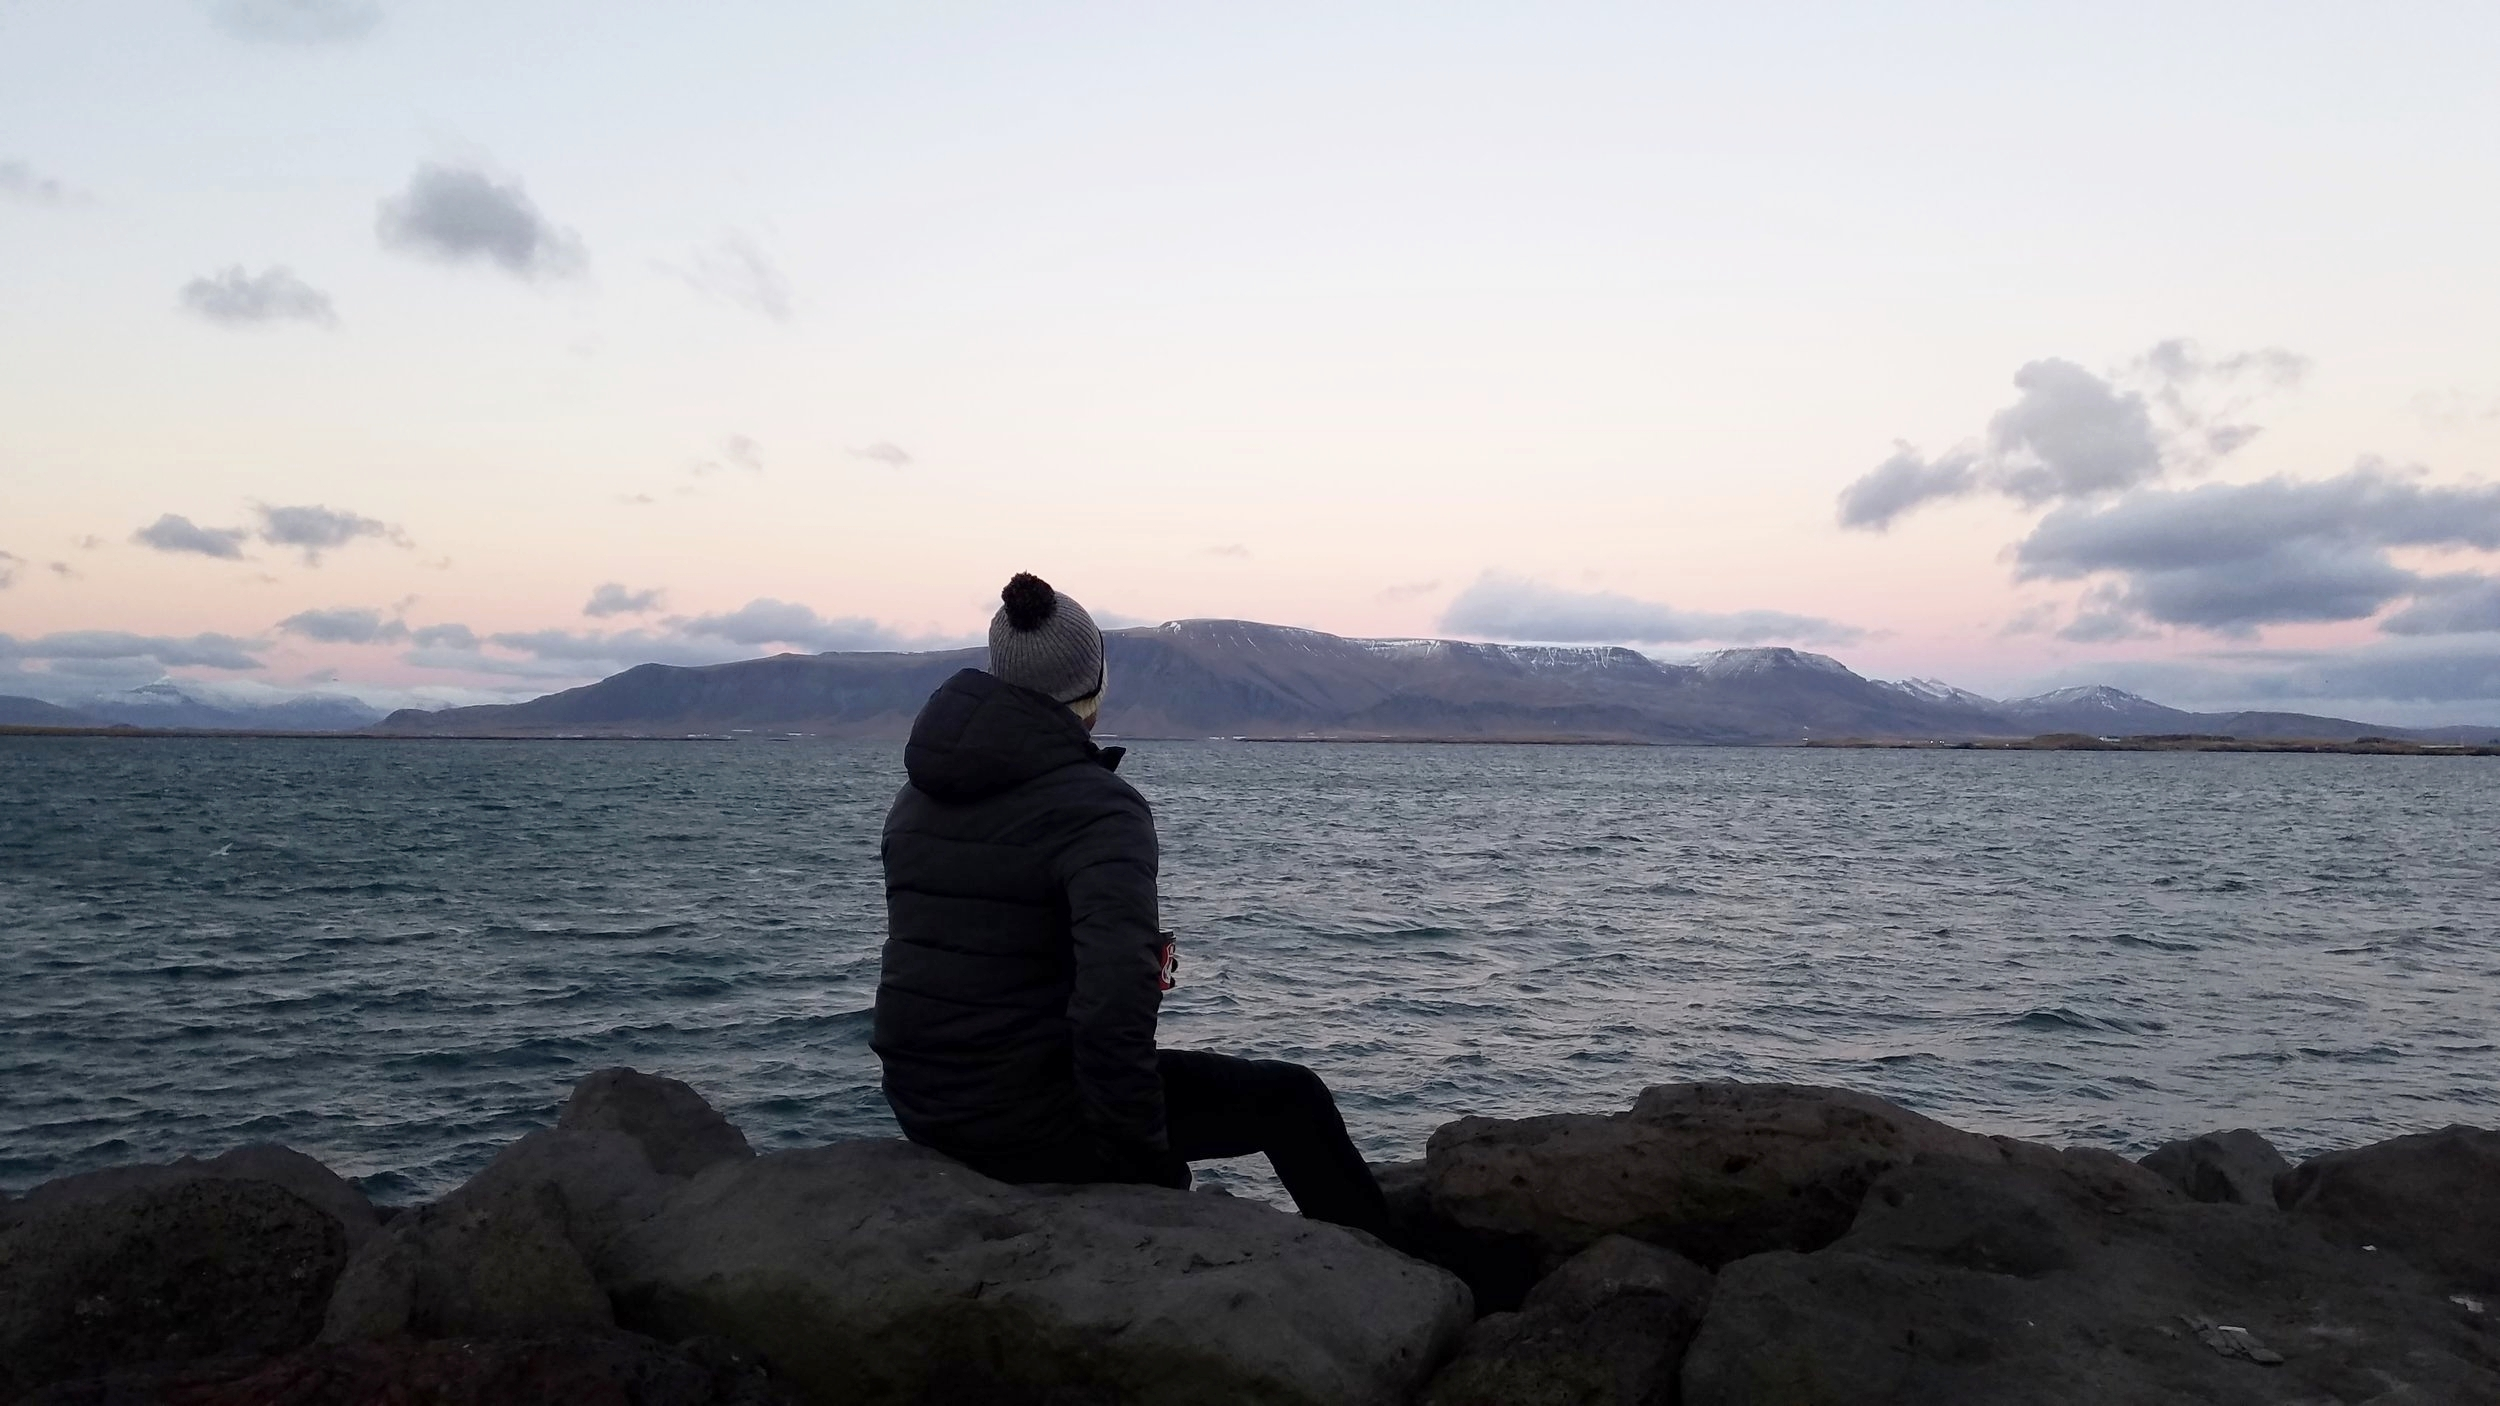 Looking northeast from downtown Reykjavík